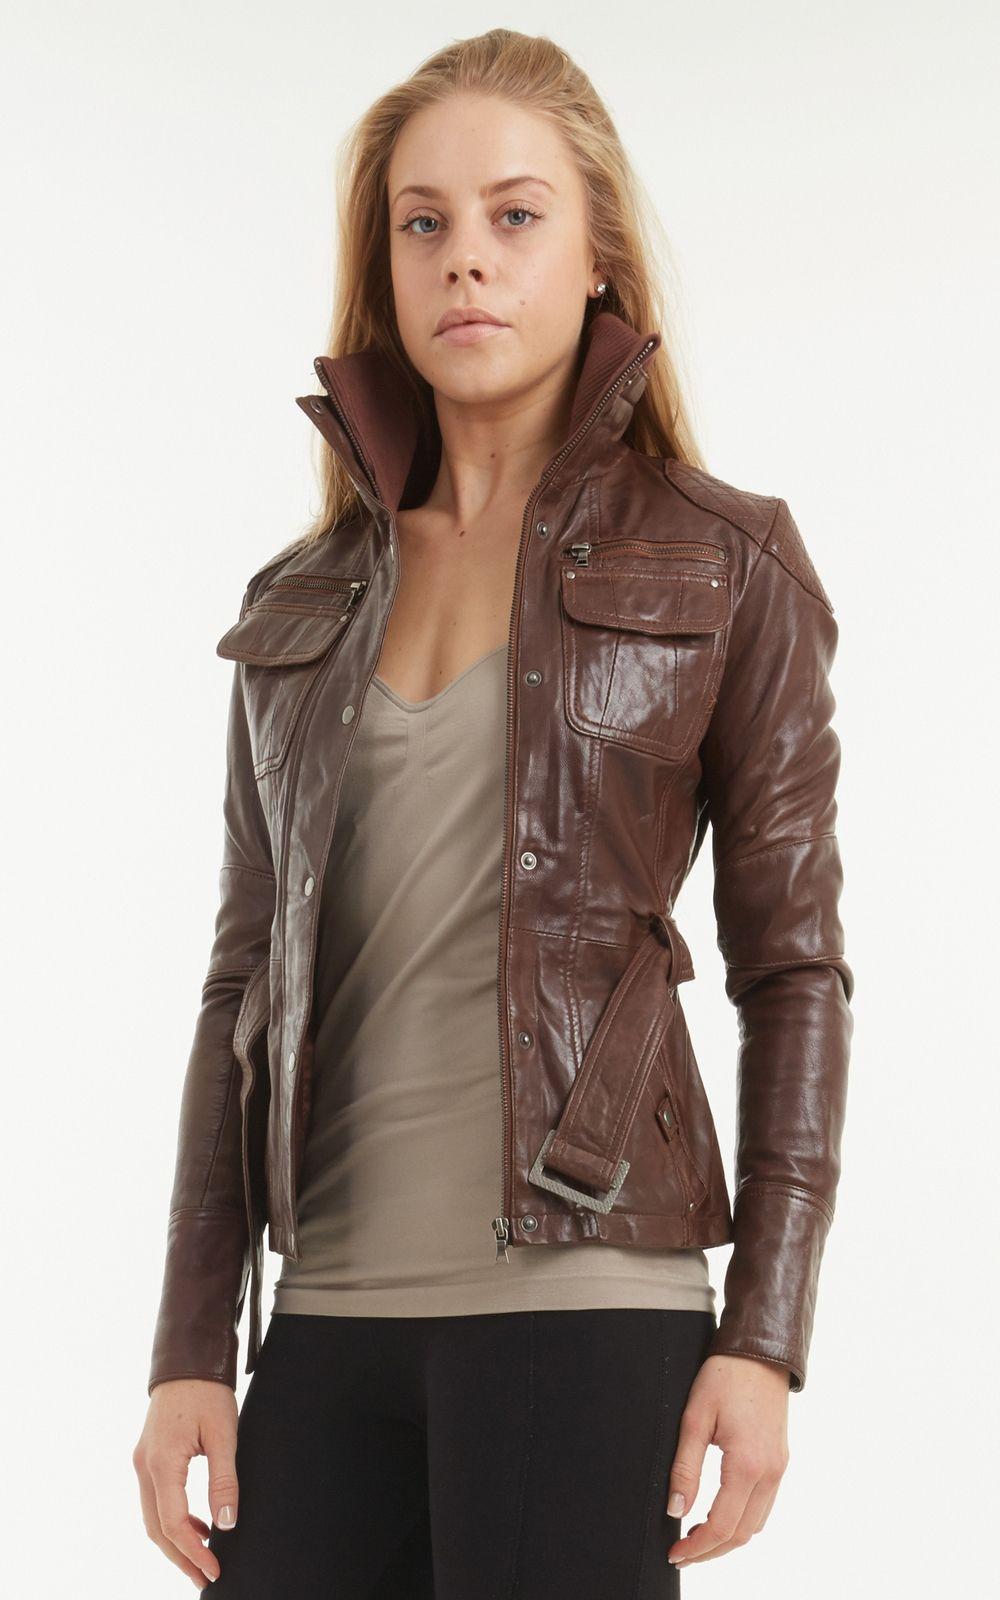 Jackets For Women Leather Coat Womens Leather Jacket Women Brown [ 1600 x 1000 Pixel ]